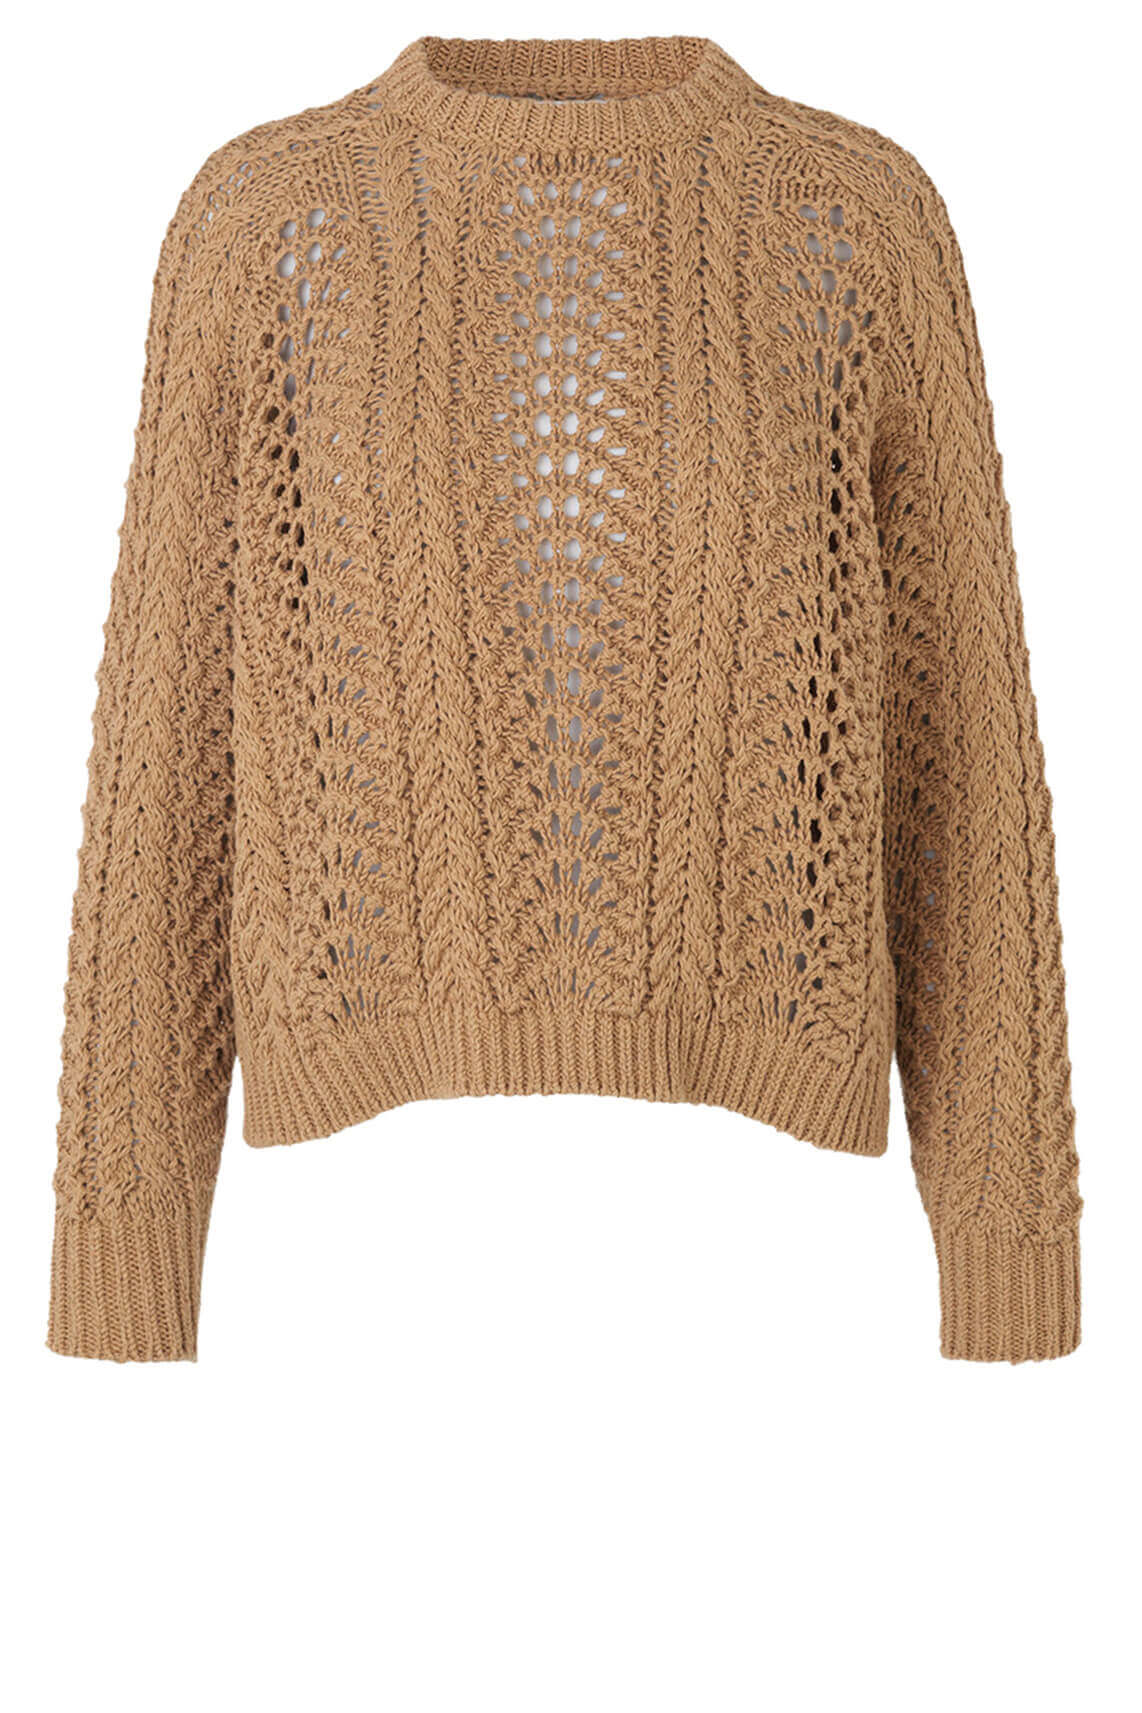 Samsoe Samsoe Dames Haimie chunky knit sweater Bruin